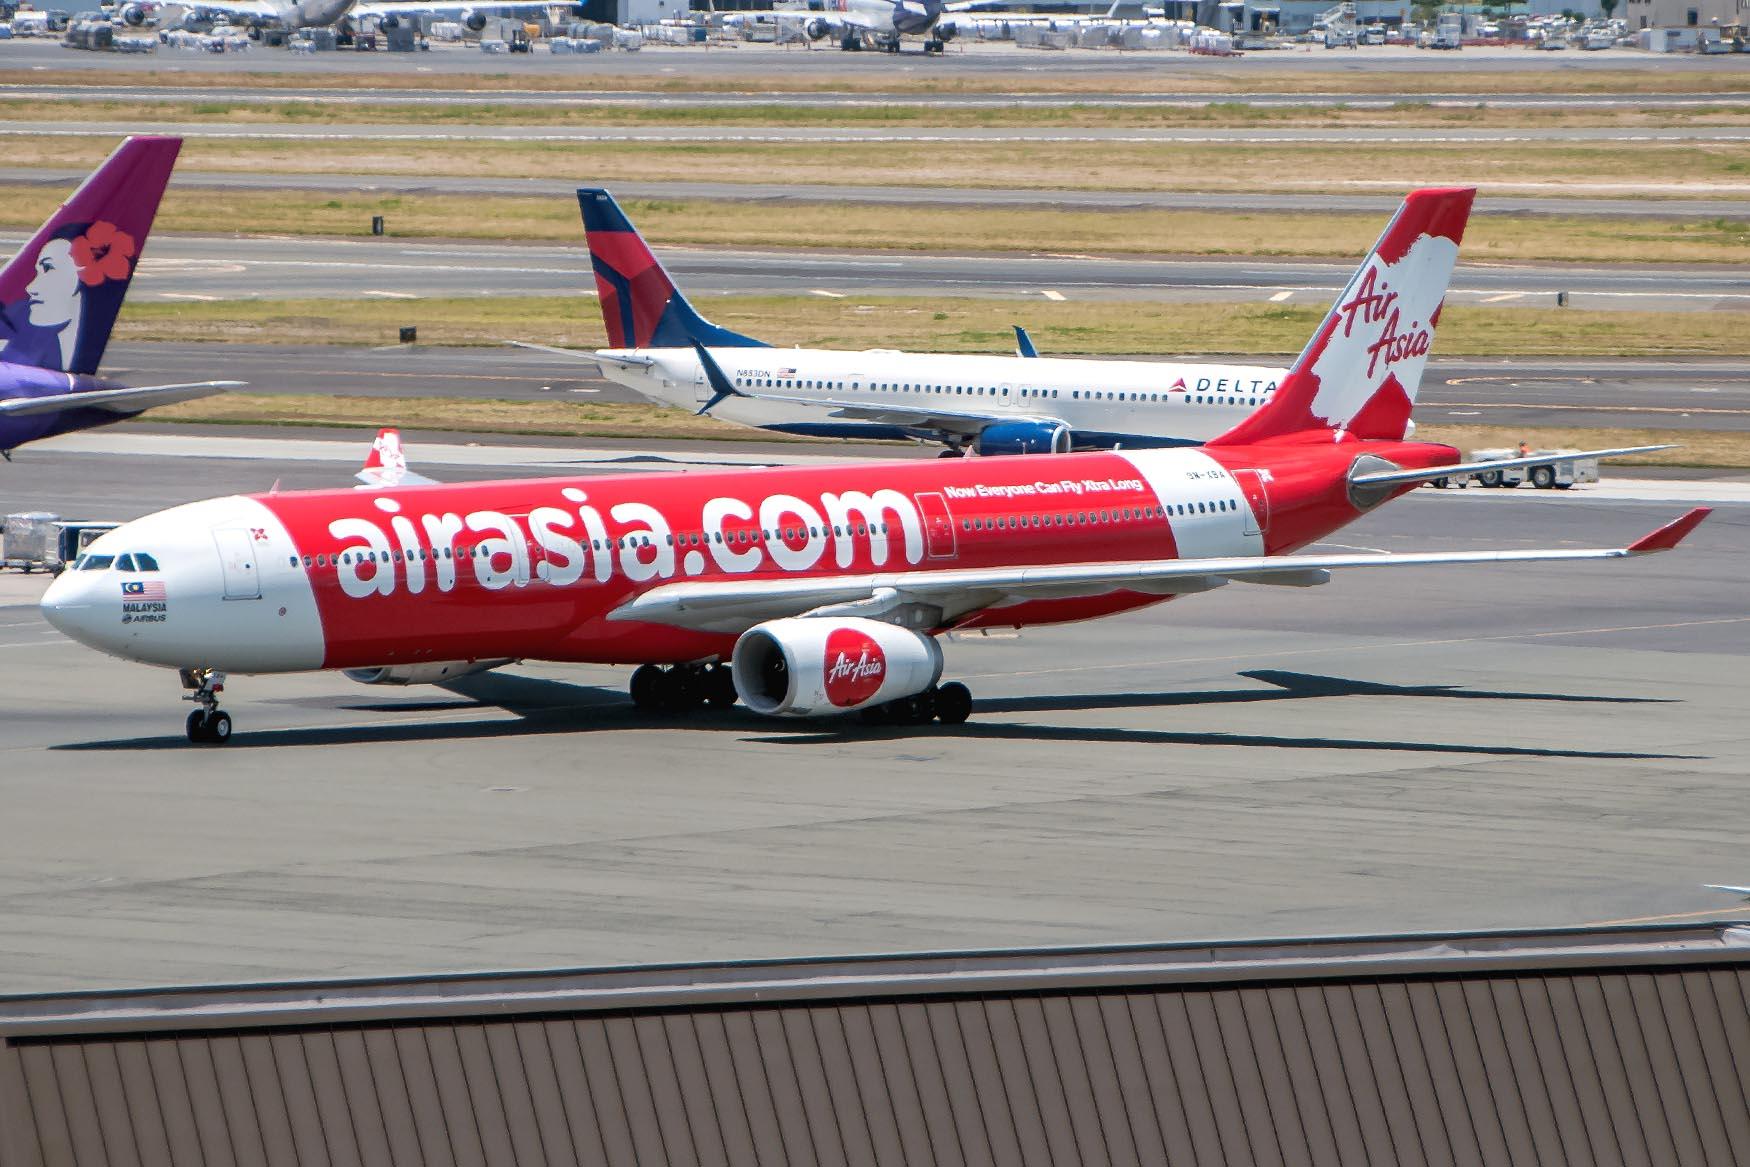 AirAsia X Arrival at Gate